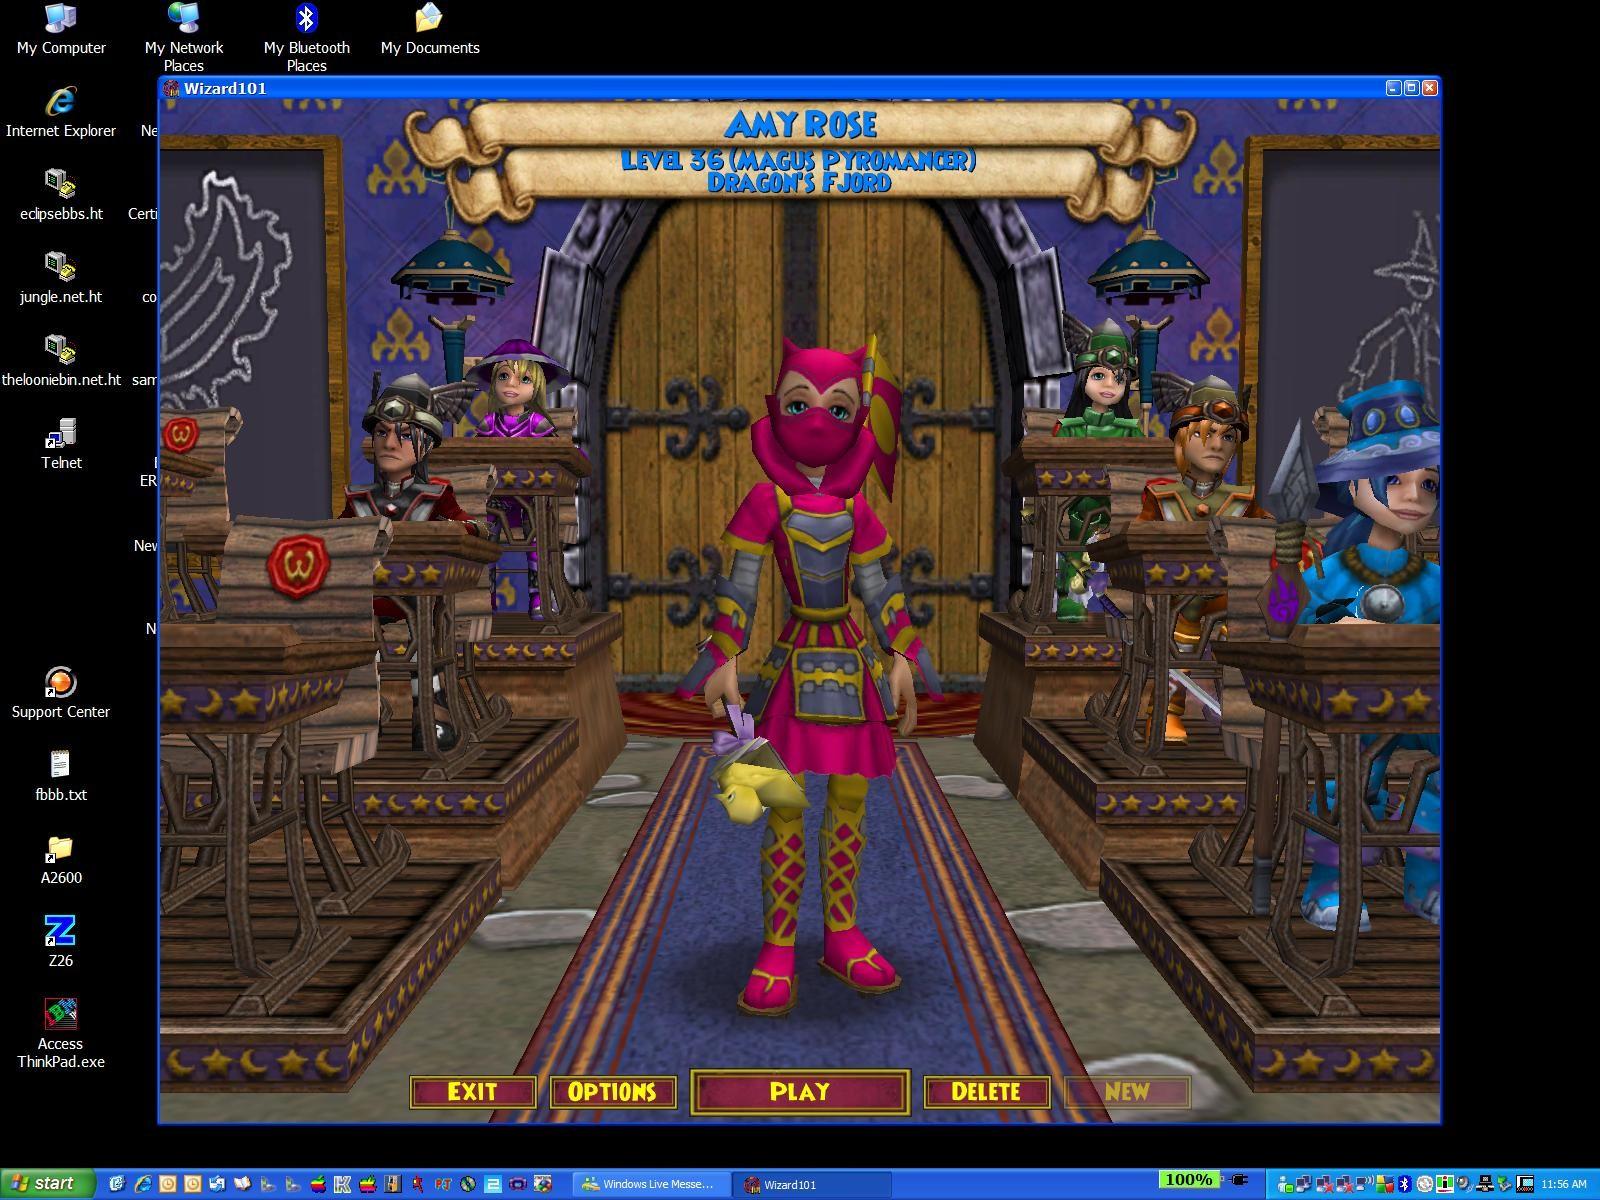 Amy Rose Fire Wizard Mmorpgcom Wizard101 Galleries